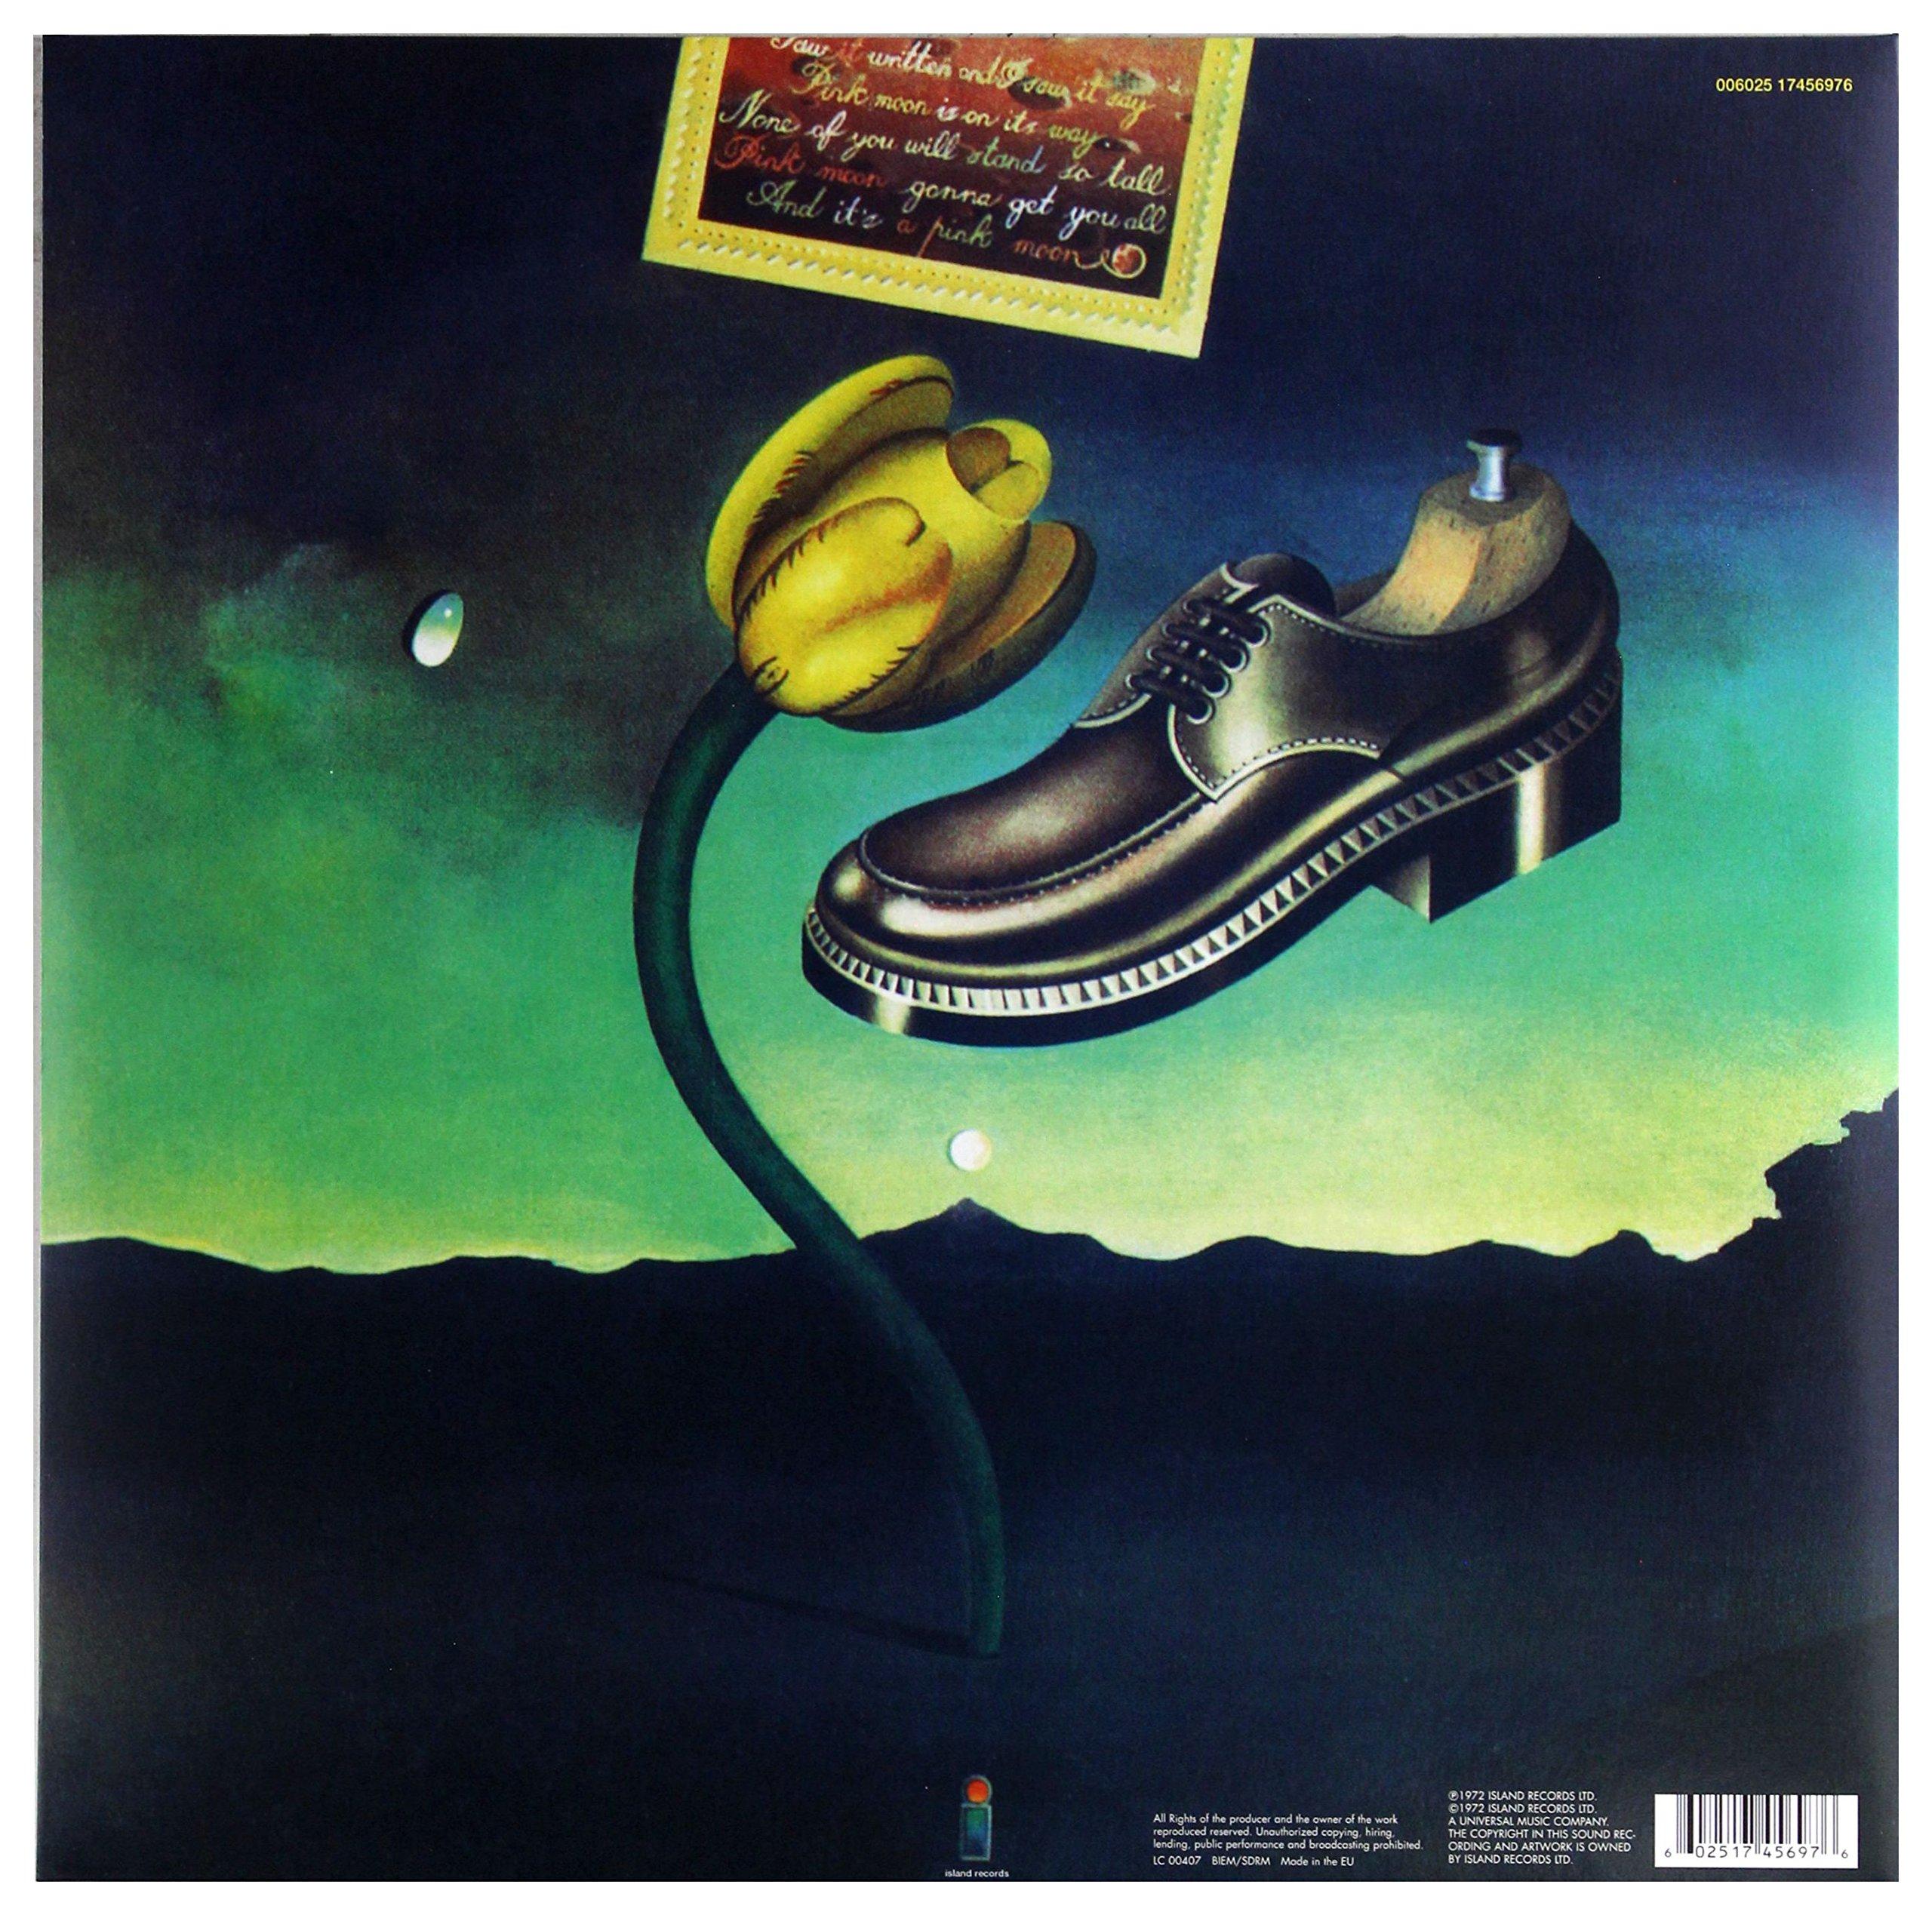 Pink Moon [Vinyl] by Ume